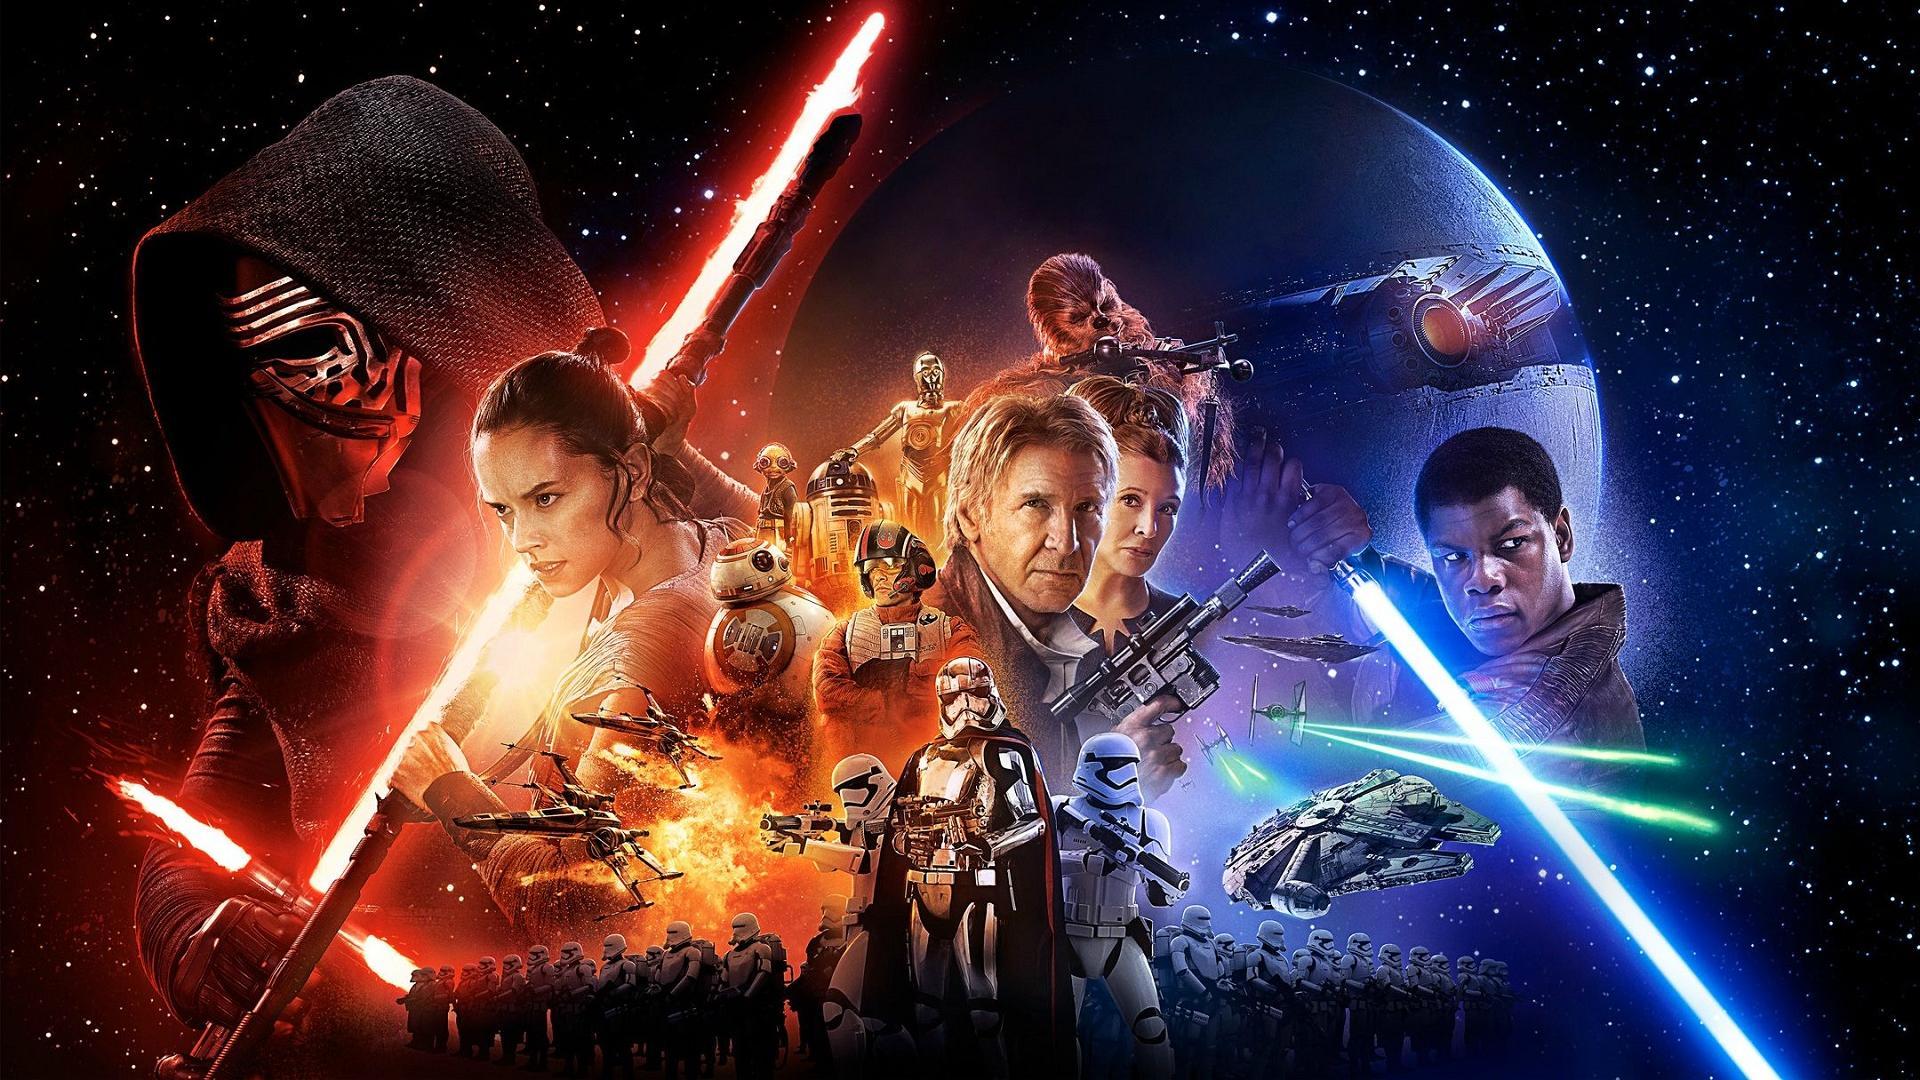 43 Star Wars Wallpapers Reddit On Wallpapersafari